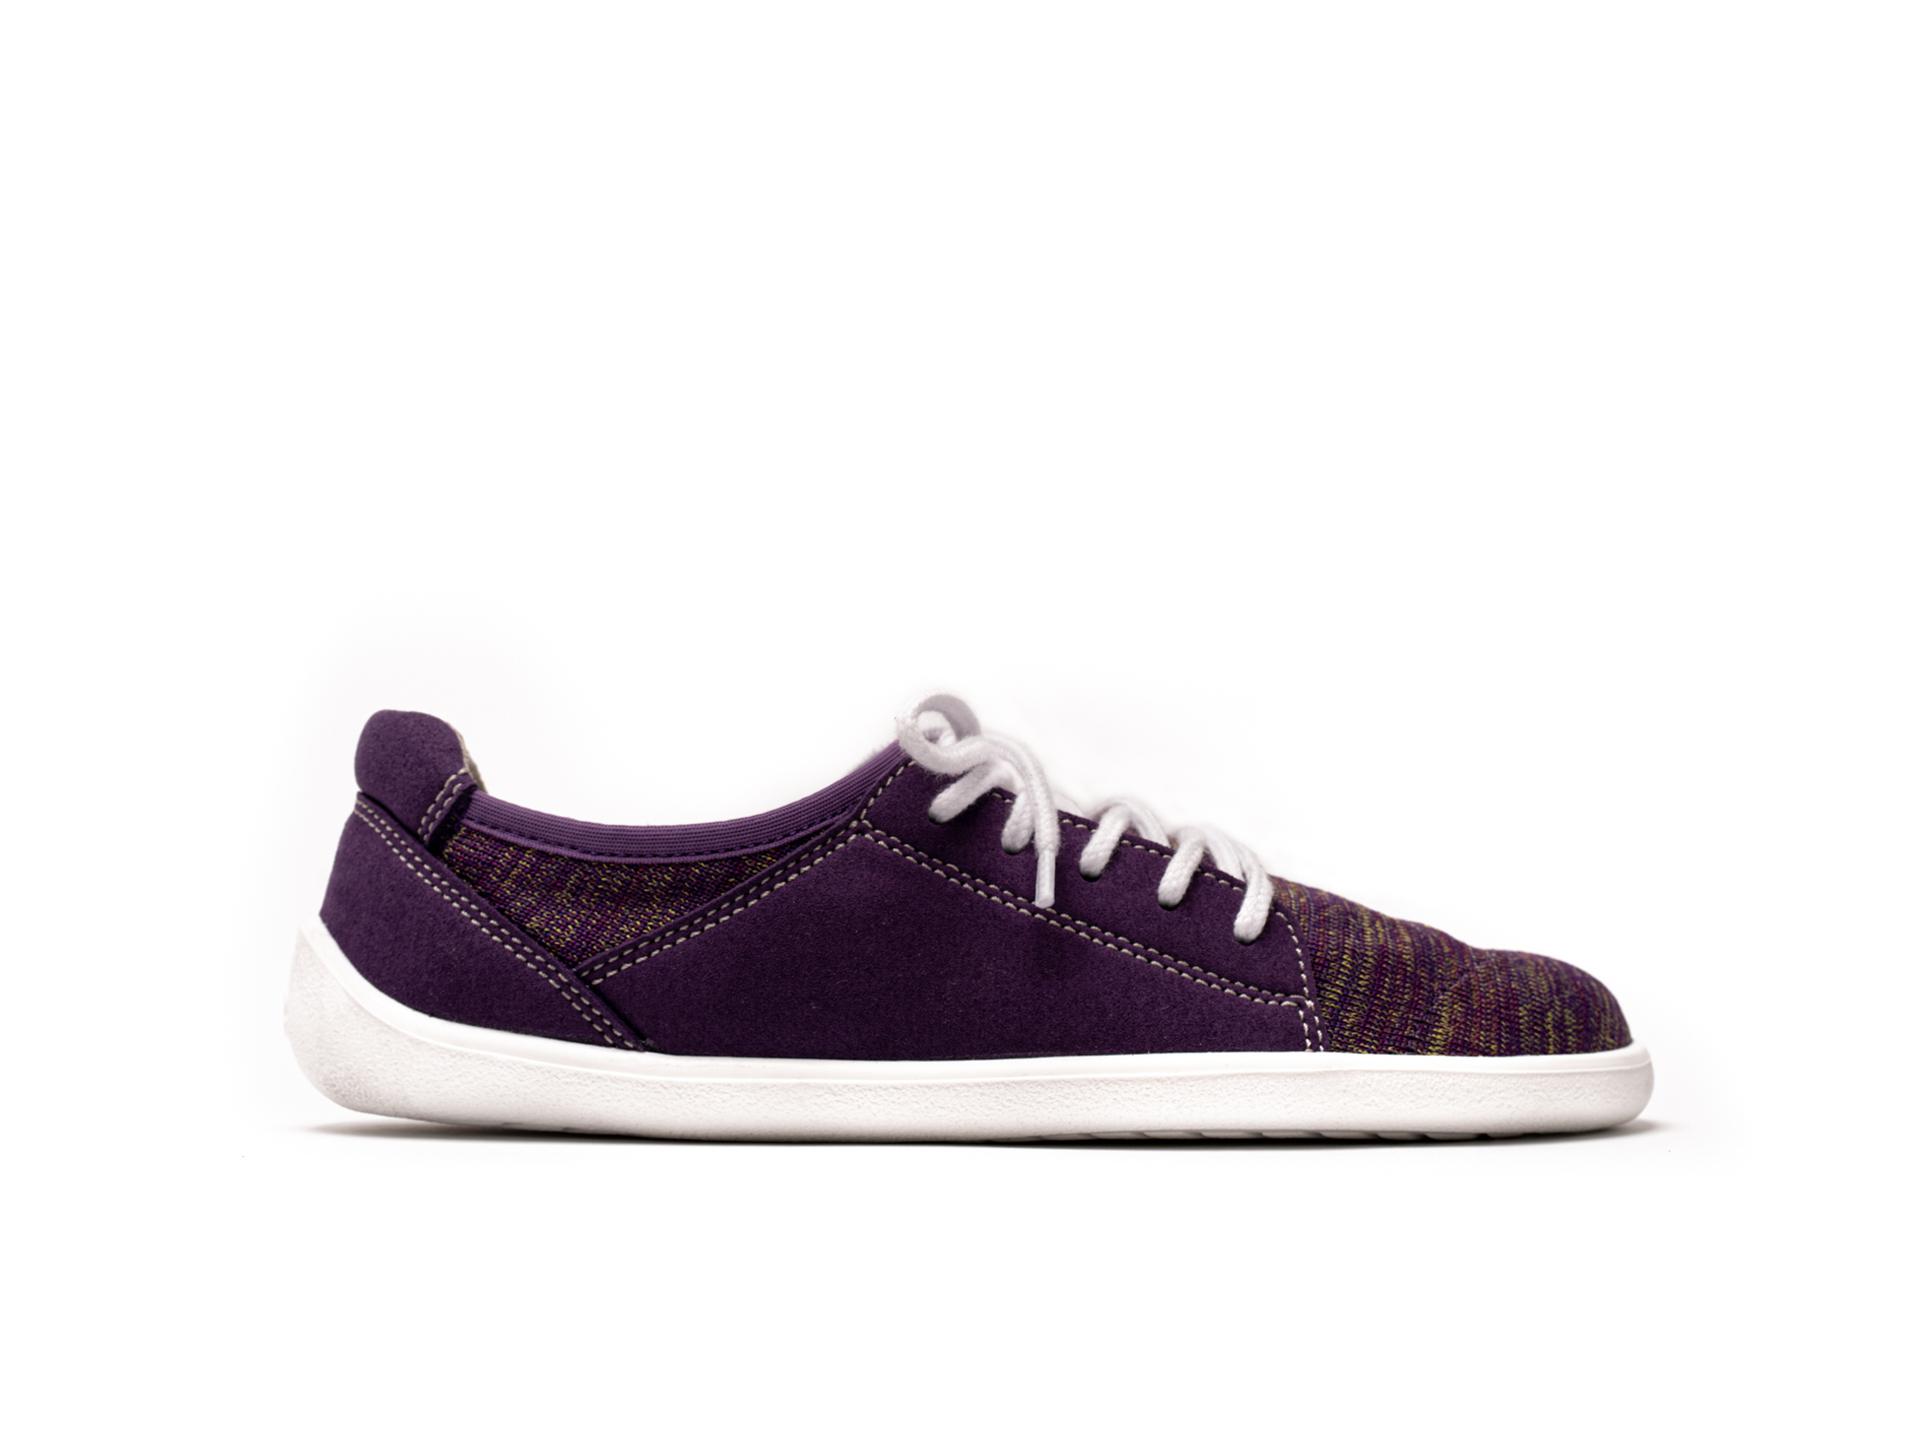 Barefoot Sneakers Be Lenka Ace - Lila 41